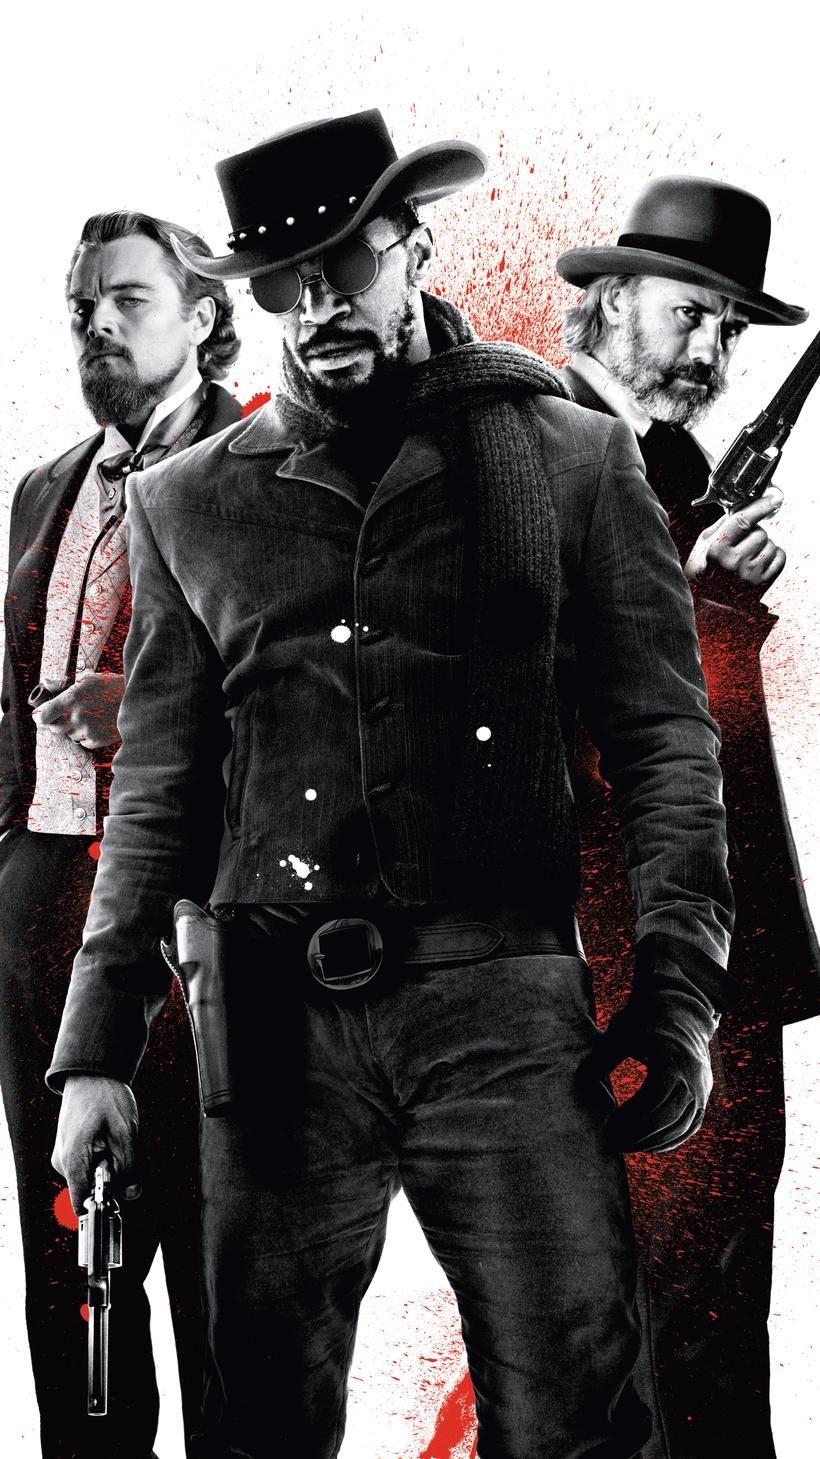 Django Unchained 2012 Phone Wallpaper Moviemania In 2020 Django Unchained Movies Movie Wallpapers